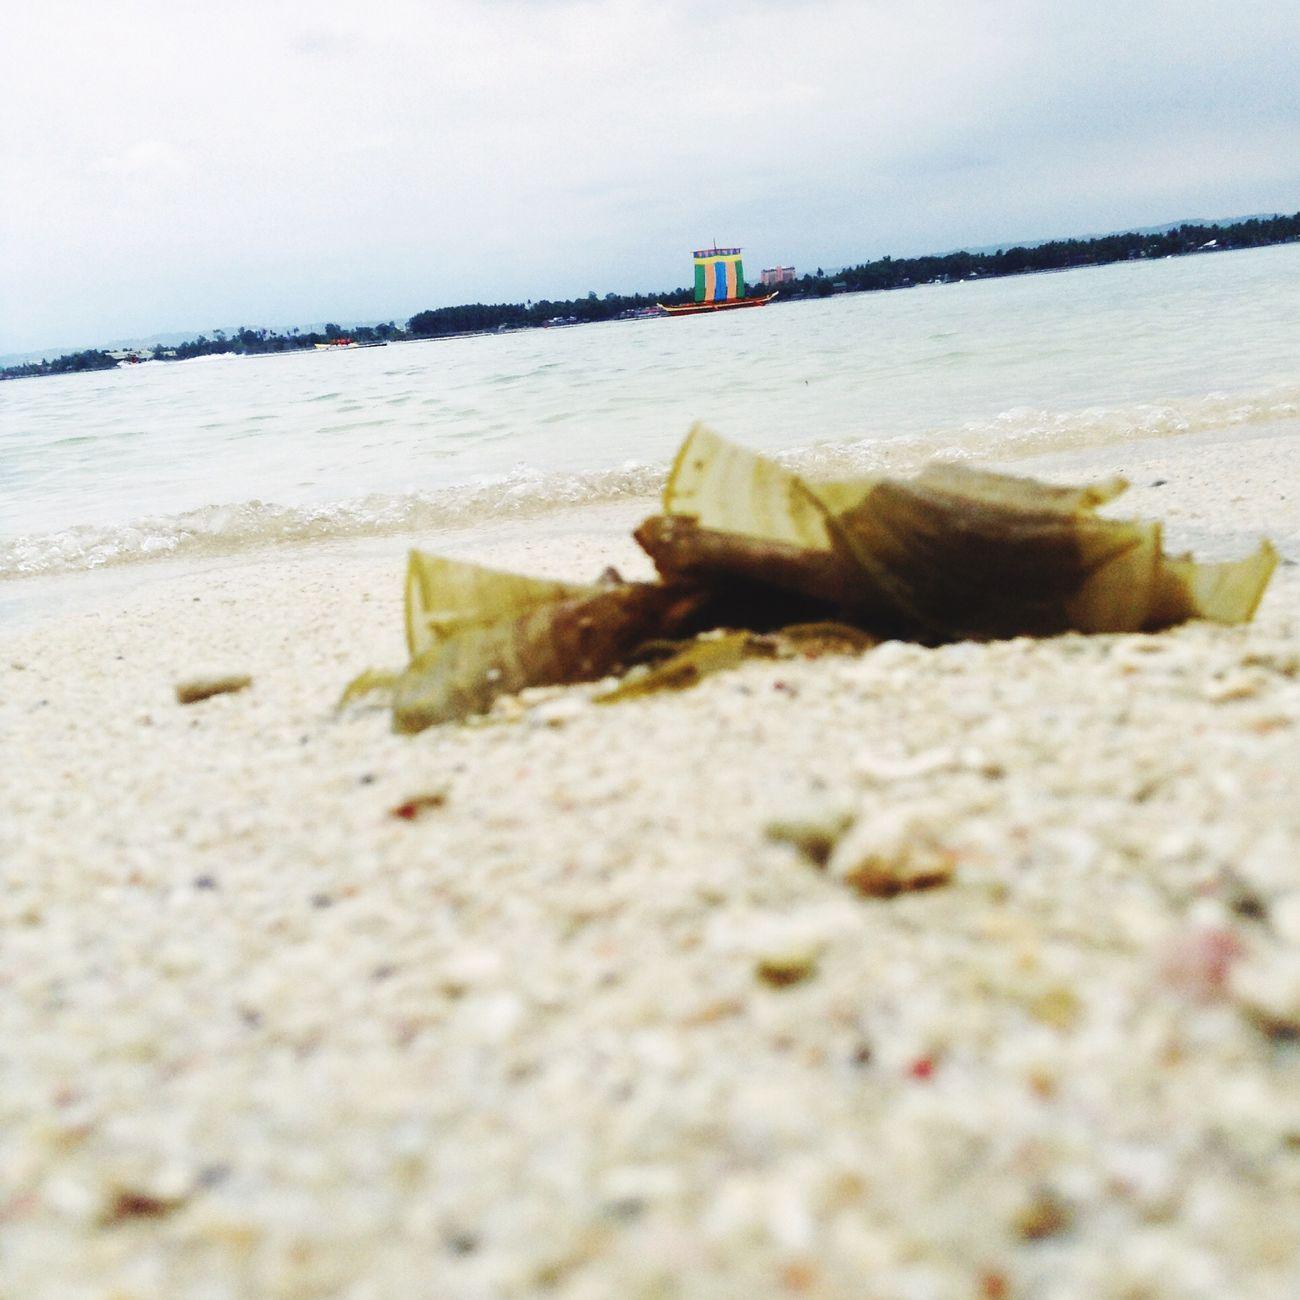 Sand Beach Boat Sea Island